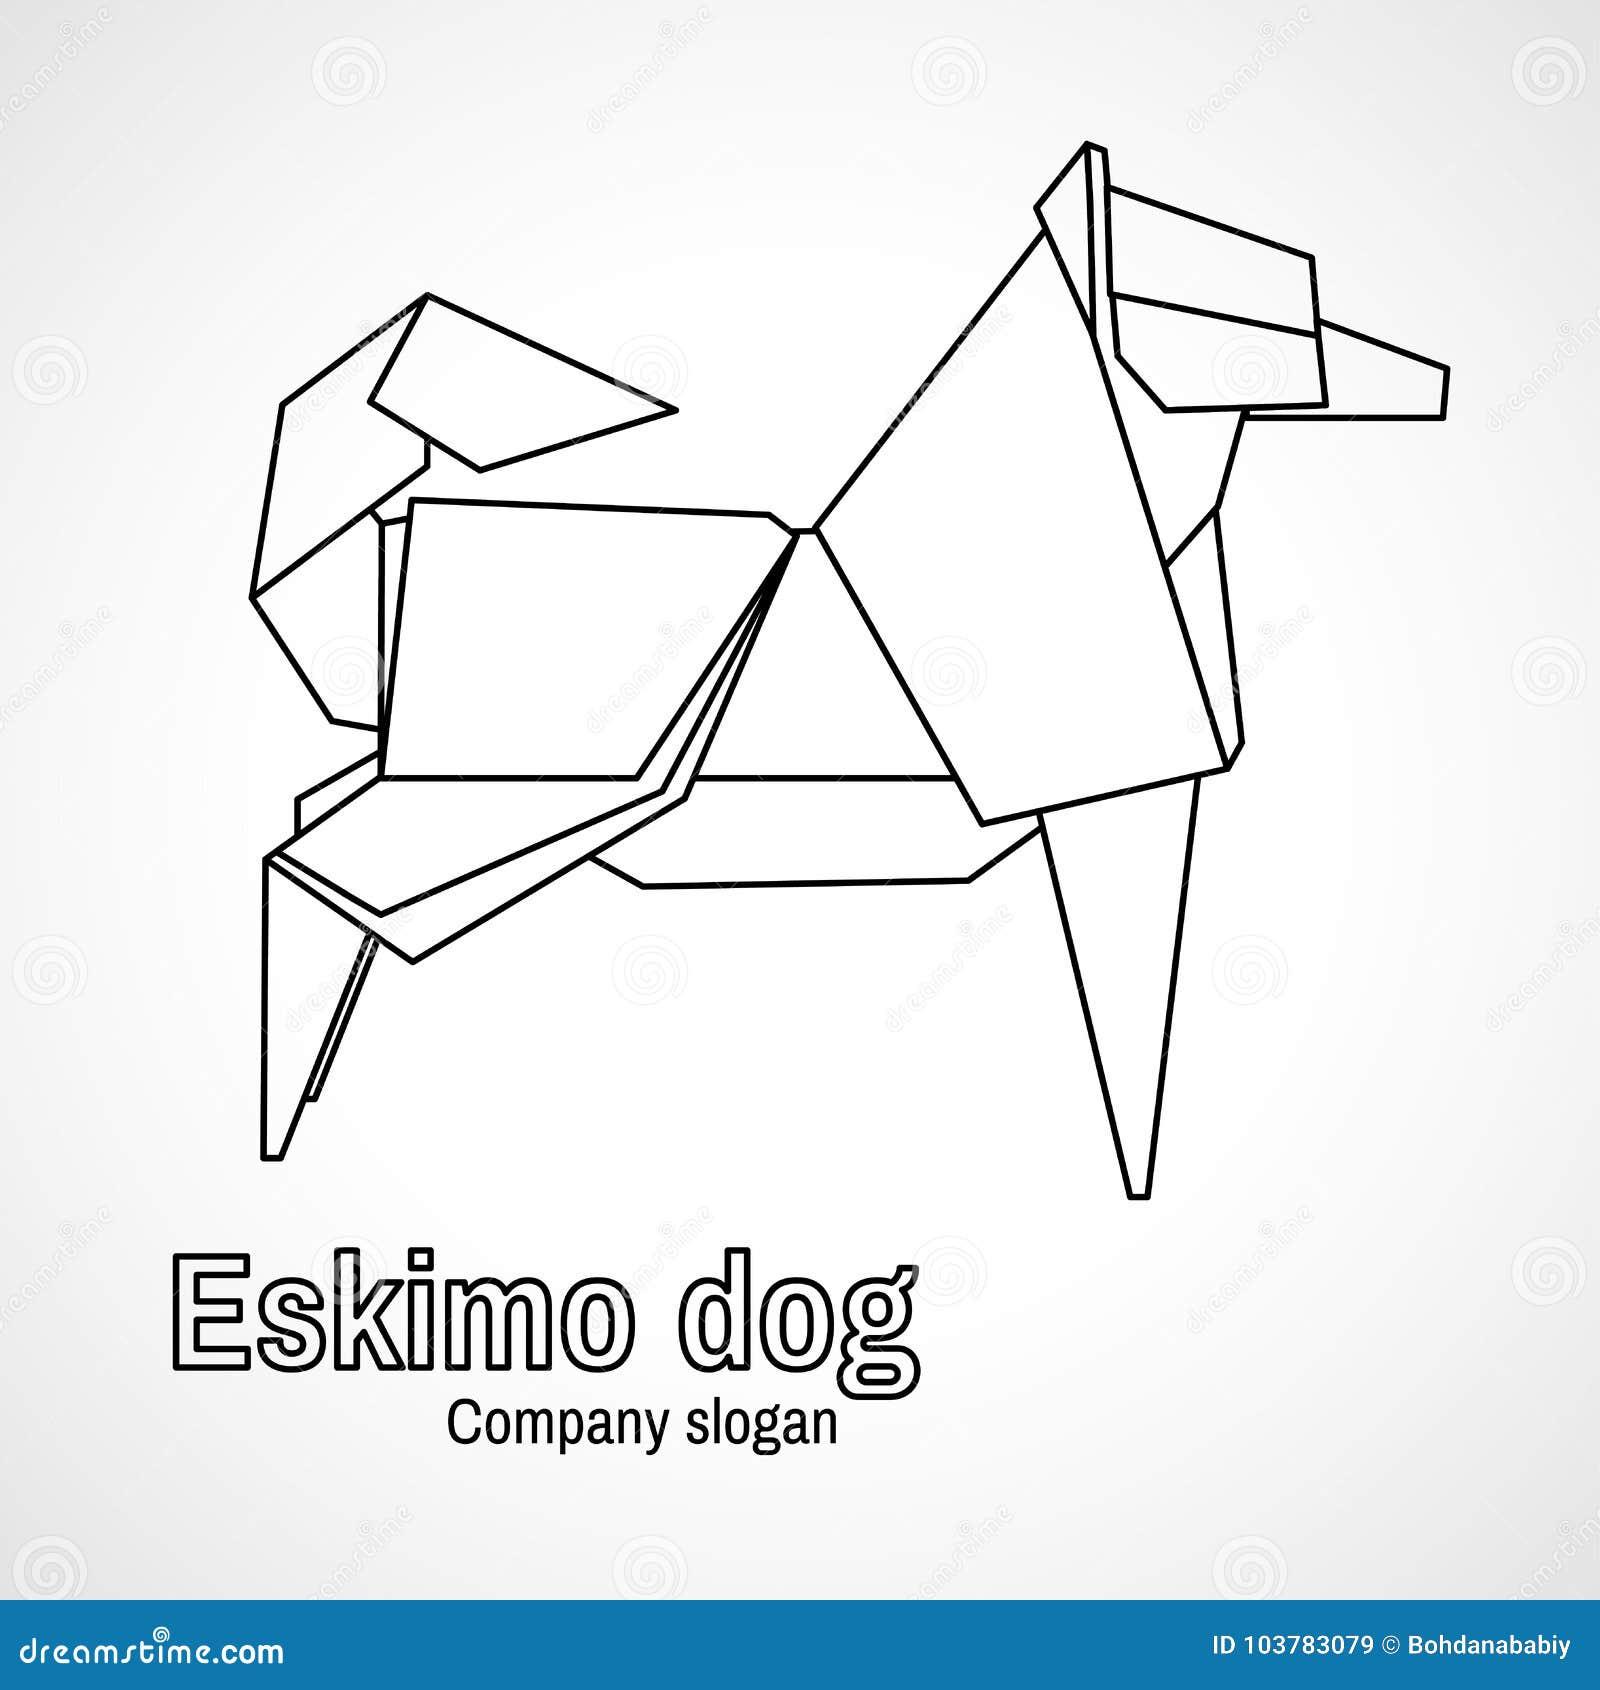 Vector Illustration Of Outline Origami Dog Stock Diagram